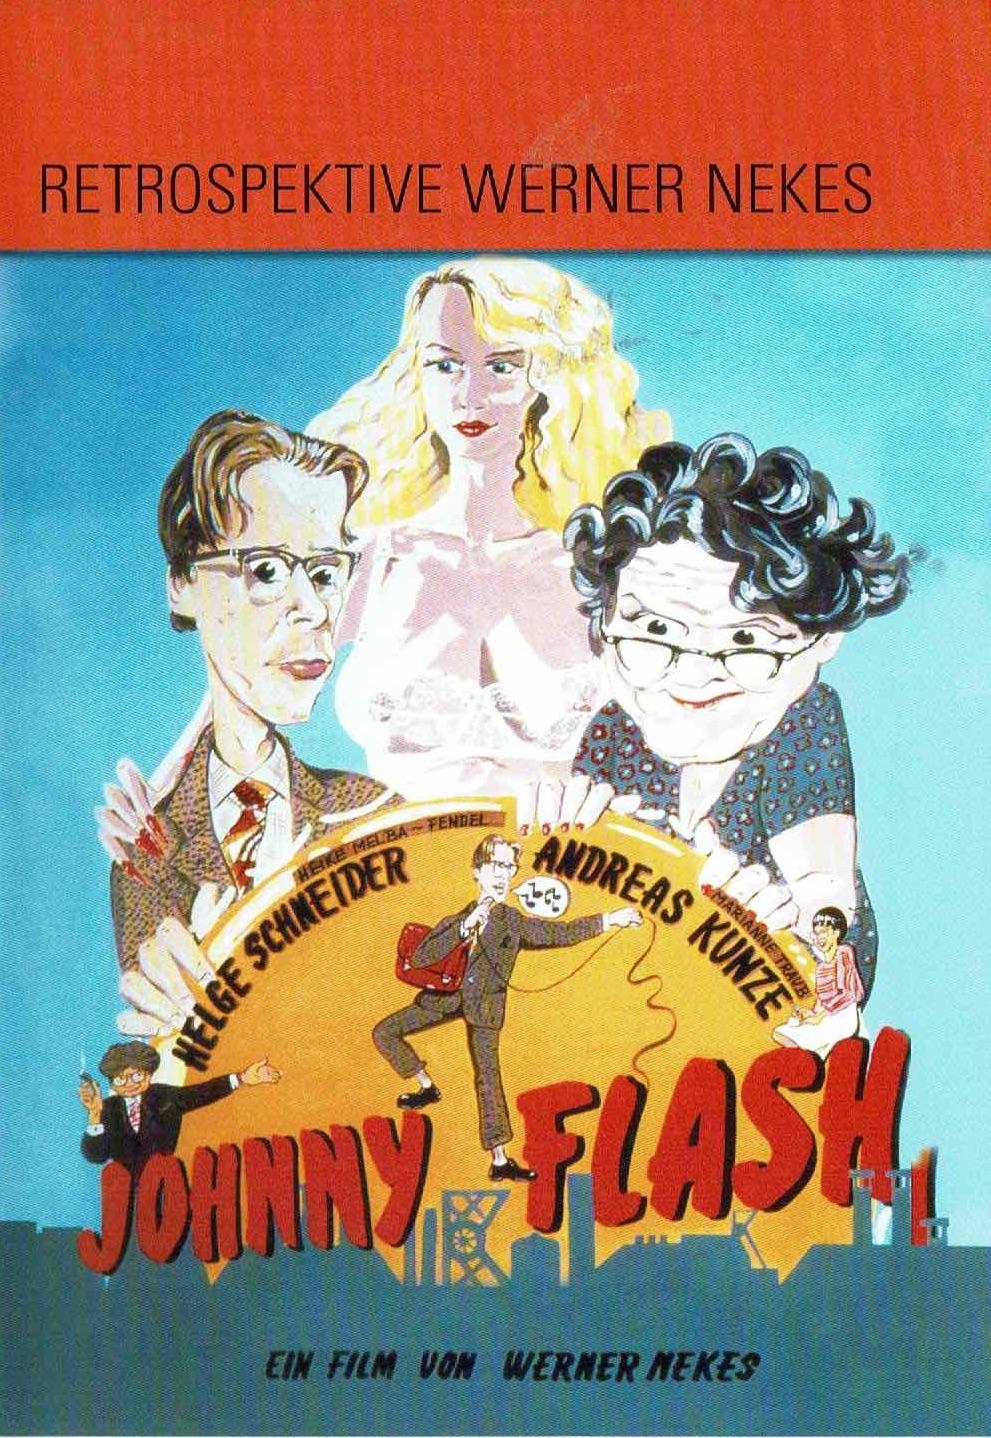 Johnny Flash